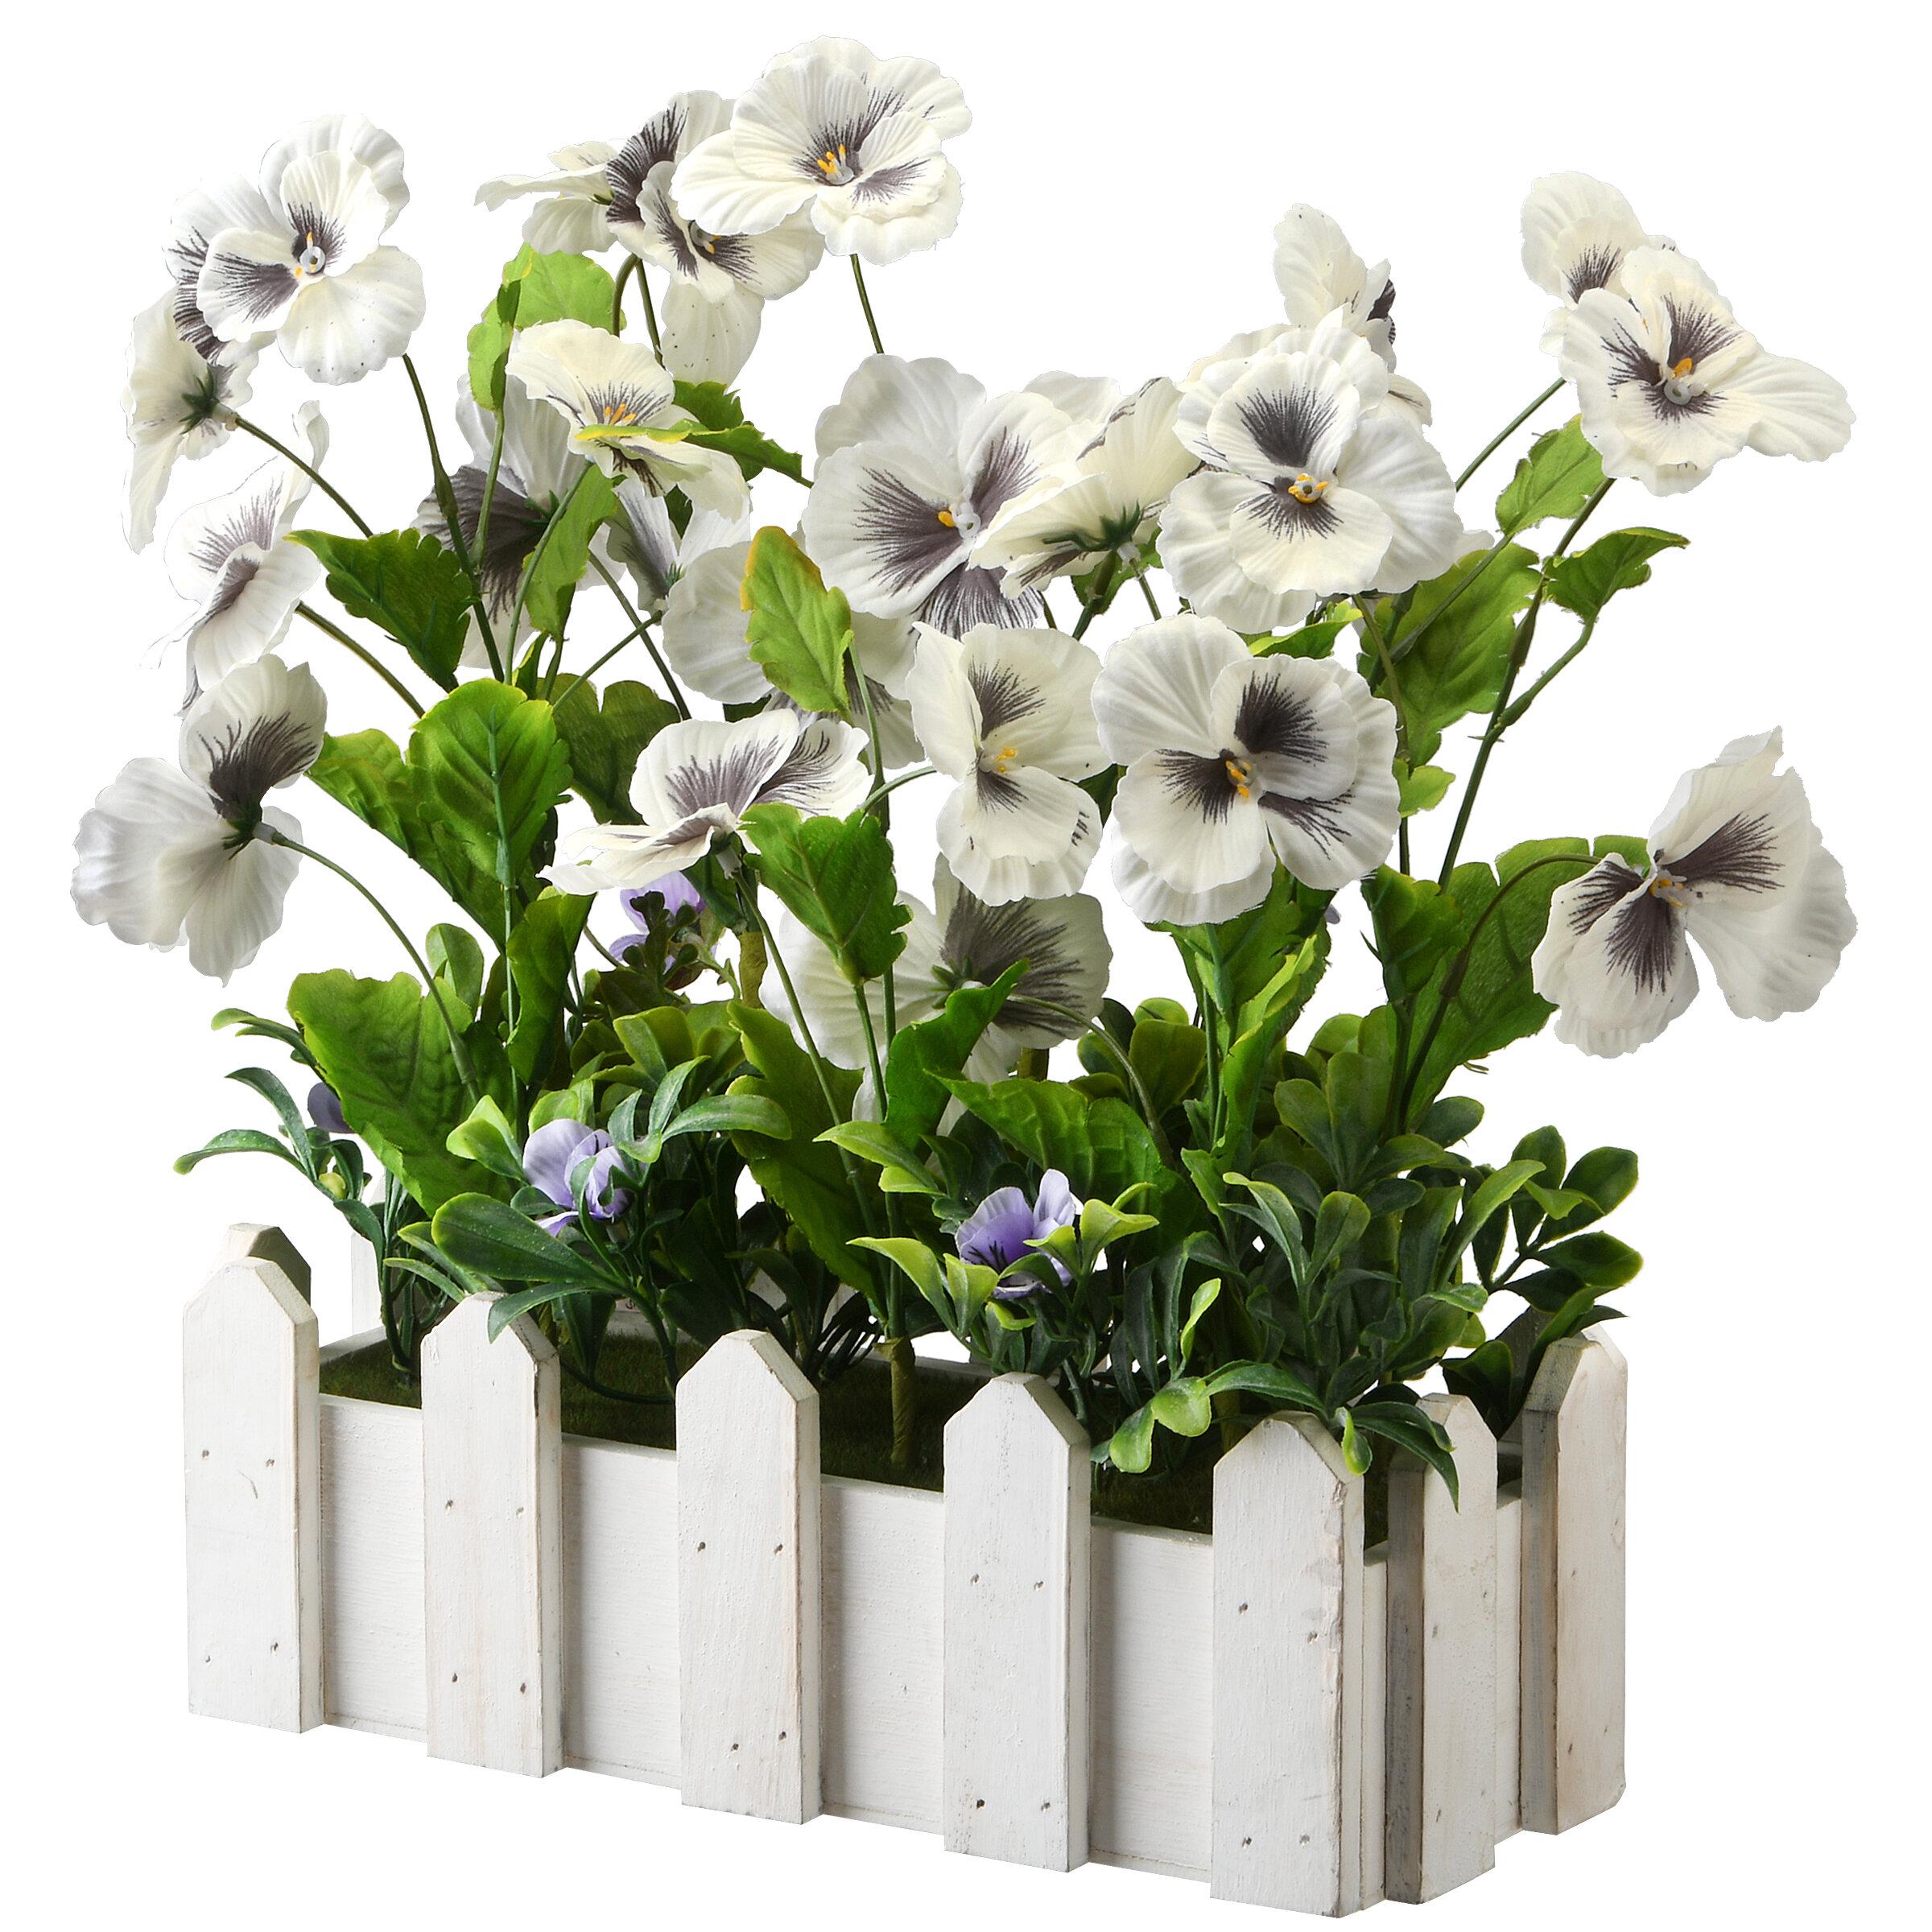 Gracie Oaks Artificial Flowering Plant In Planter Reviews Wayfair